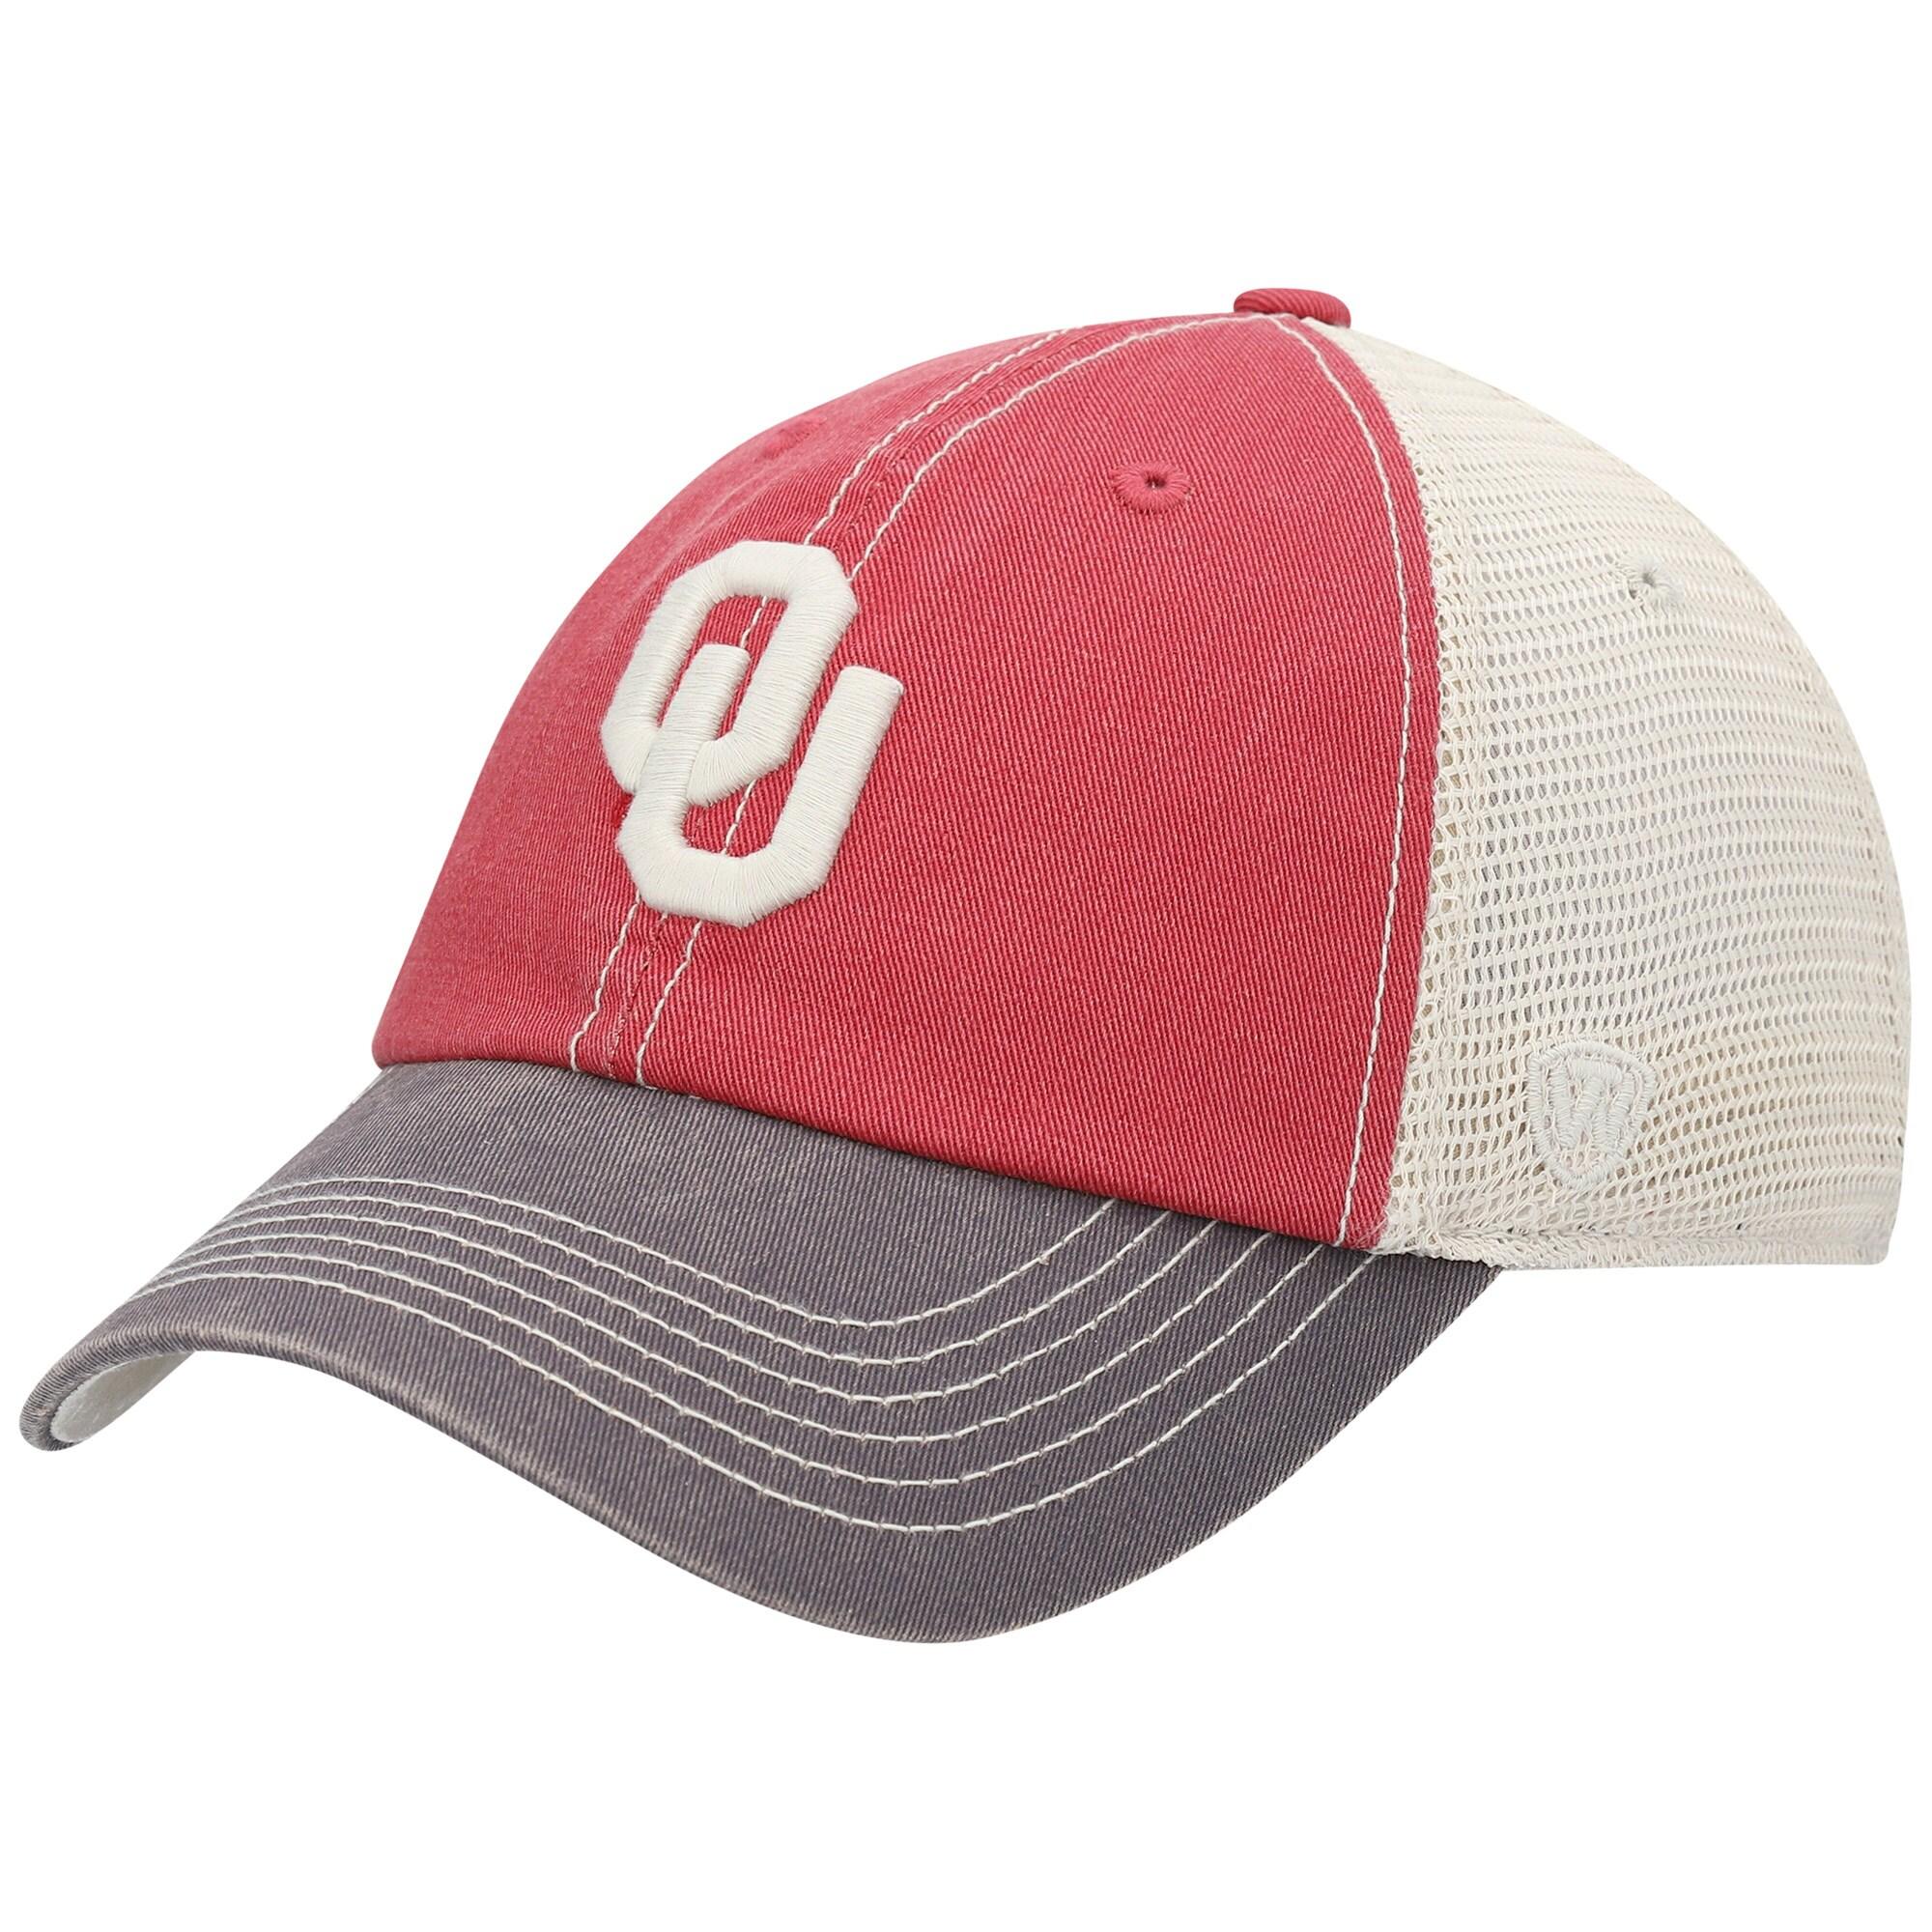 Oklahoma Sooners Top of the World Offroad Trucker Adjustable Hat - Crimson